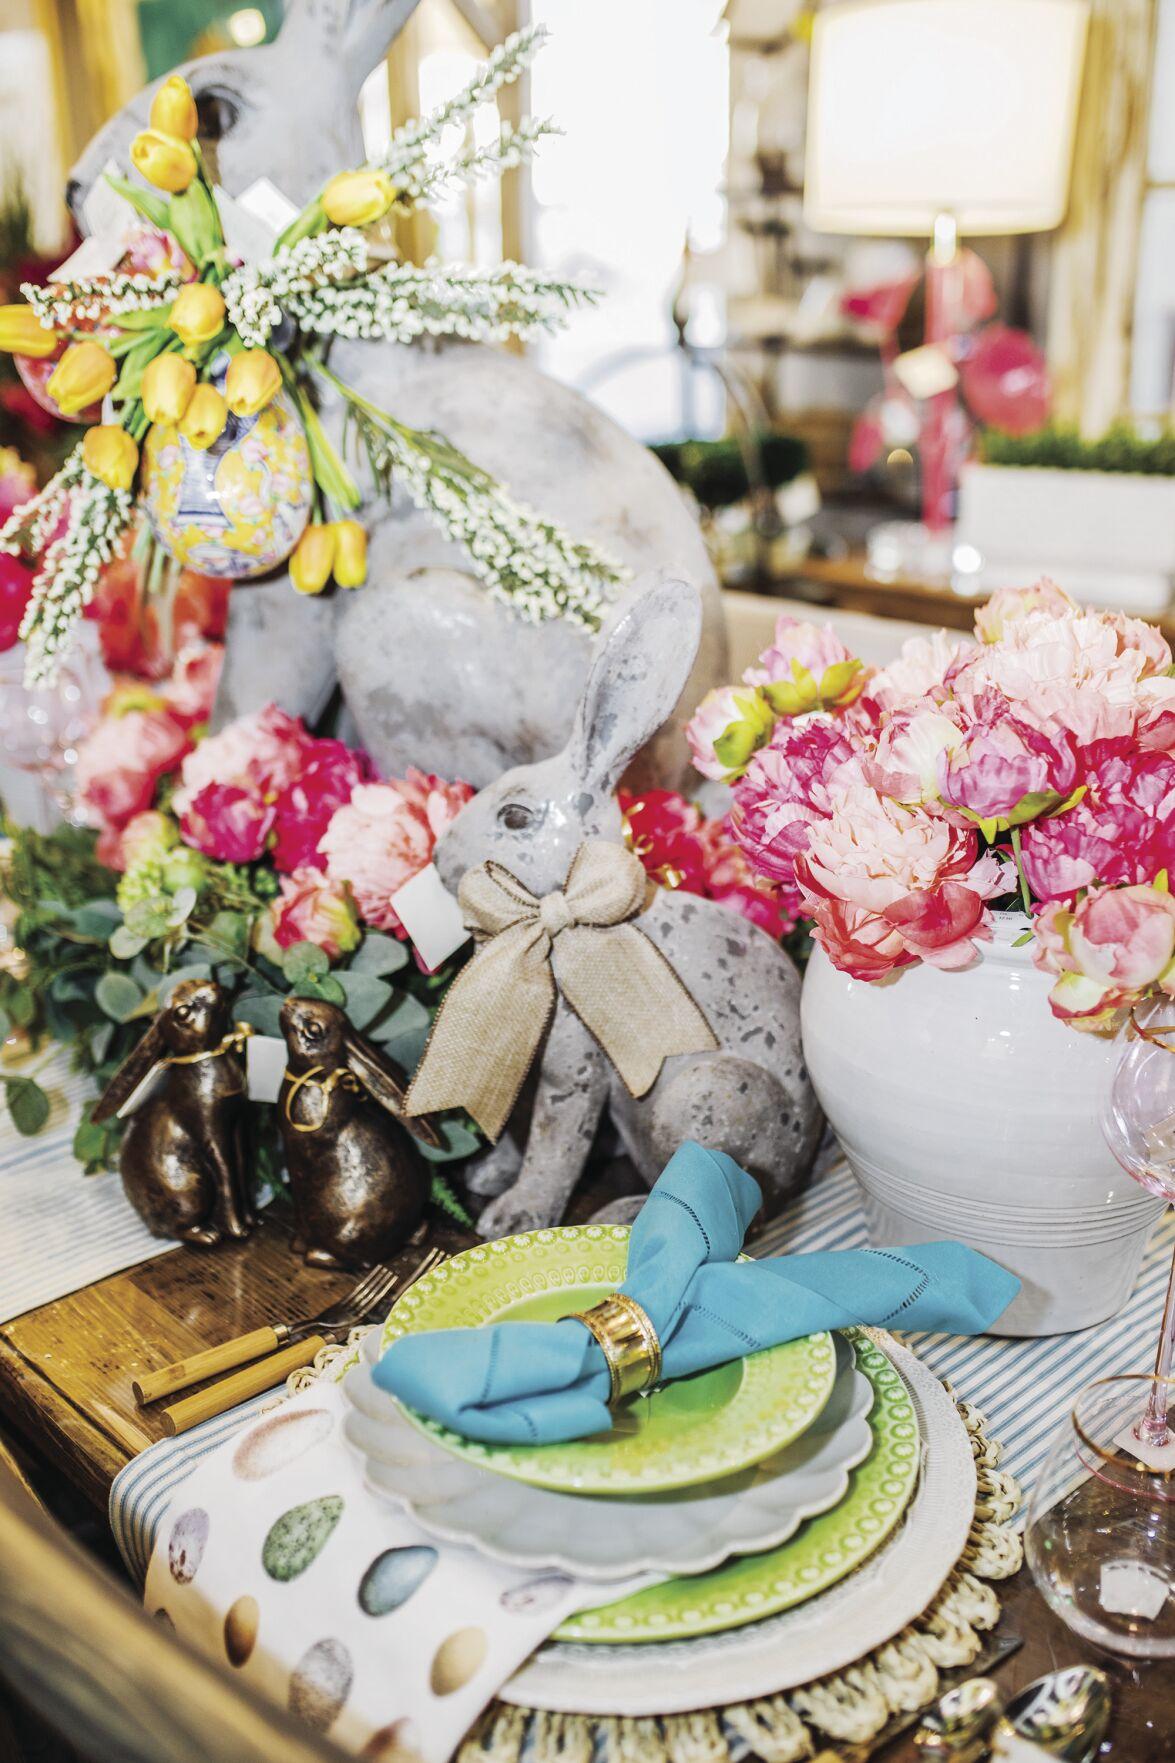 Festive Figurines